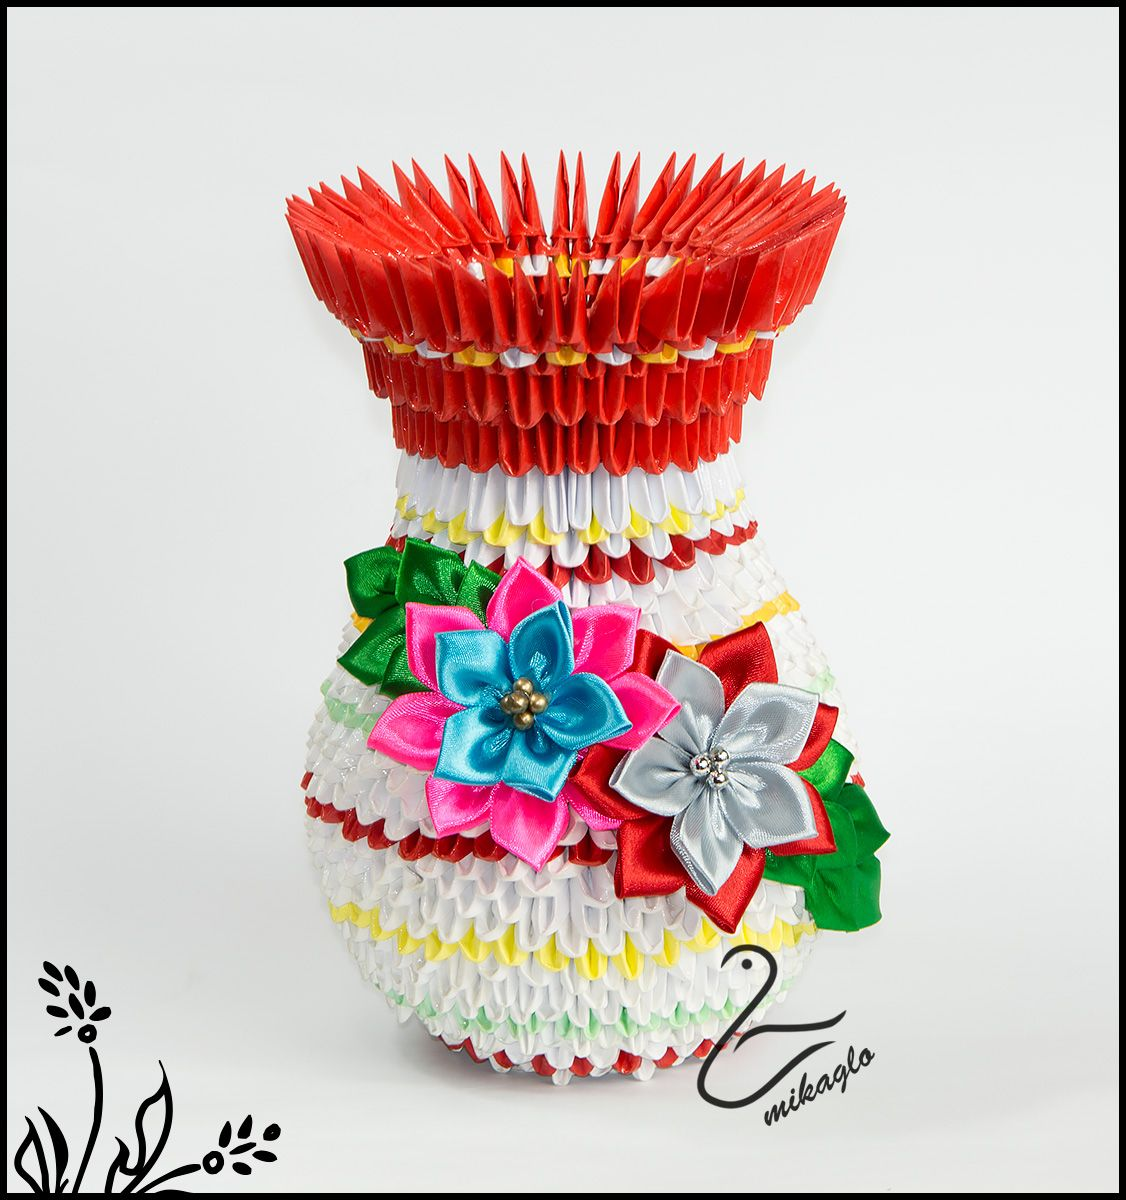 Flower vase tutorial mikaglospot origami 3d 2015 flower vase tutorial gt mikaglospot dollar origami 3d origami mightylinksfo